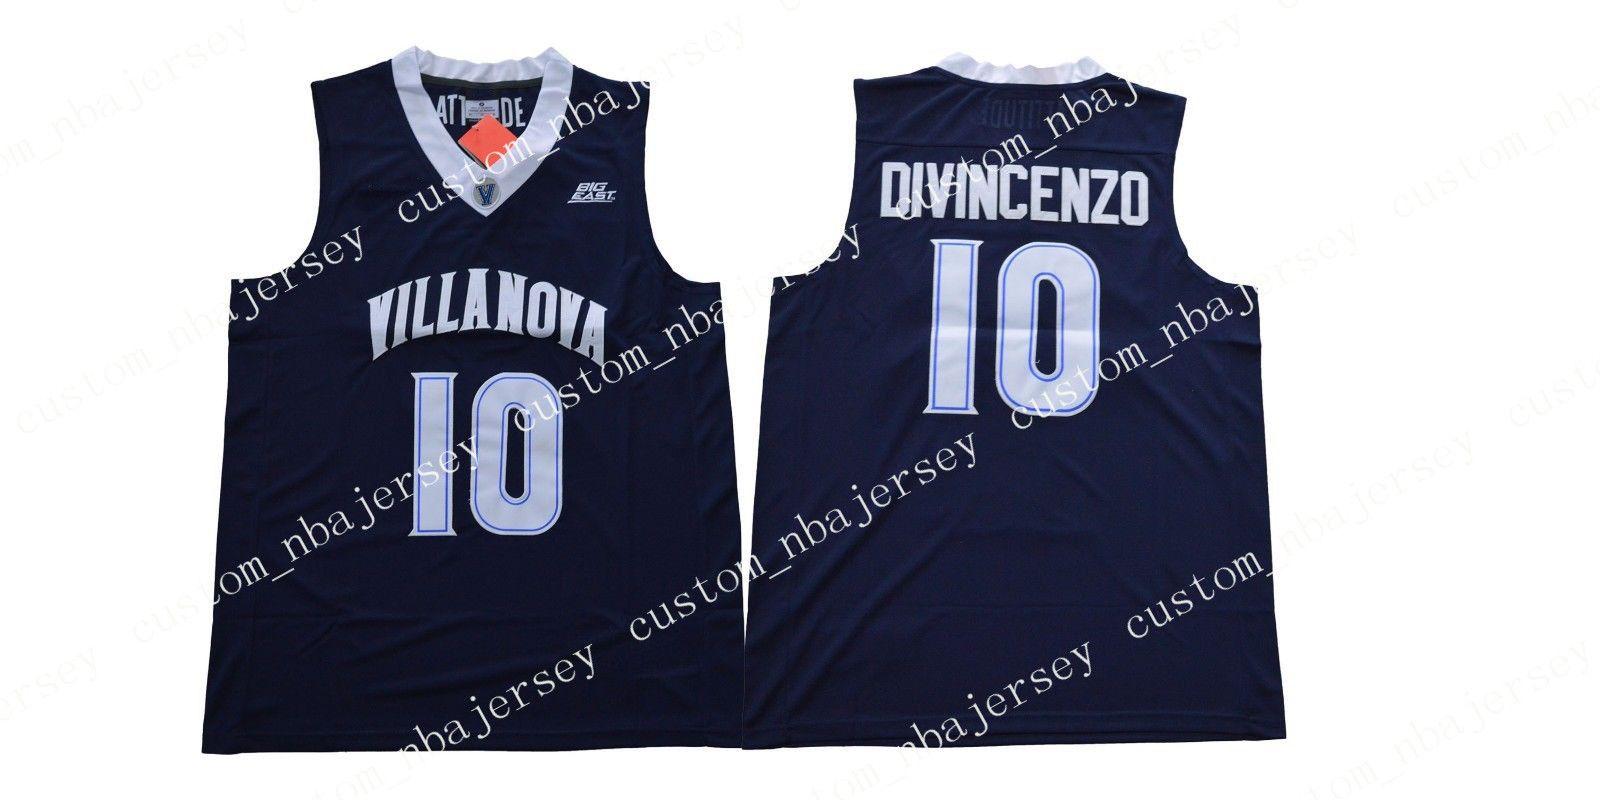 b7b6d7638 Cheap Wholesale NEW Season 2018 Donte Divincenzo  10 Villanova Basketball  Jersey Navy Blue White High Quality S XXL Canada 2019 From  Custom nbajersey